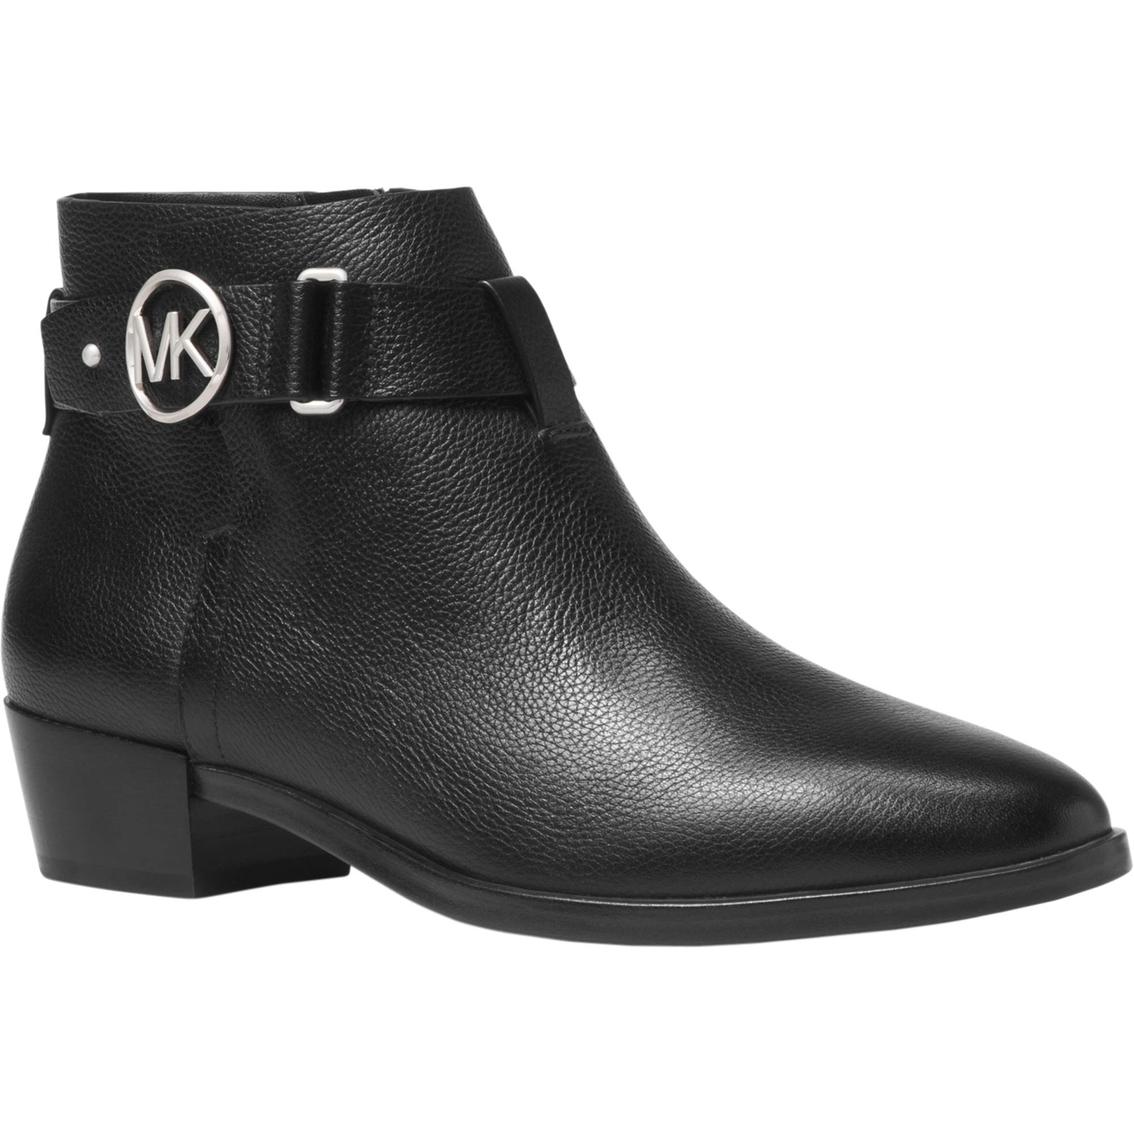 michael kors harland booties booties shoes shop the exchange rh shopmyexchange com